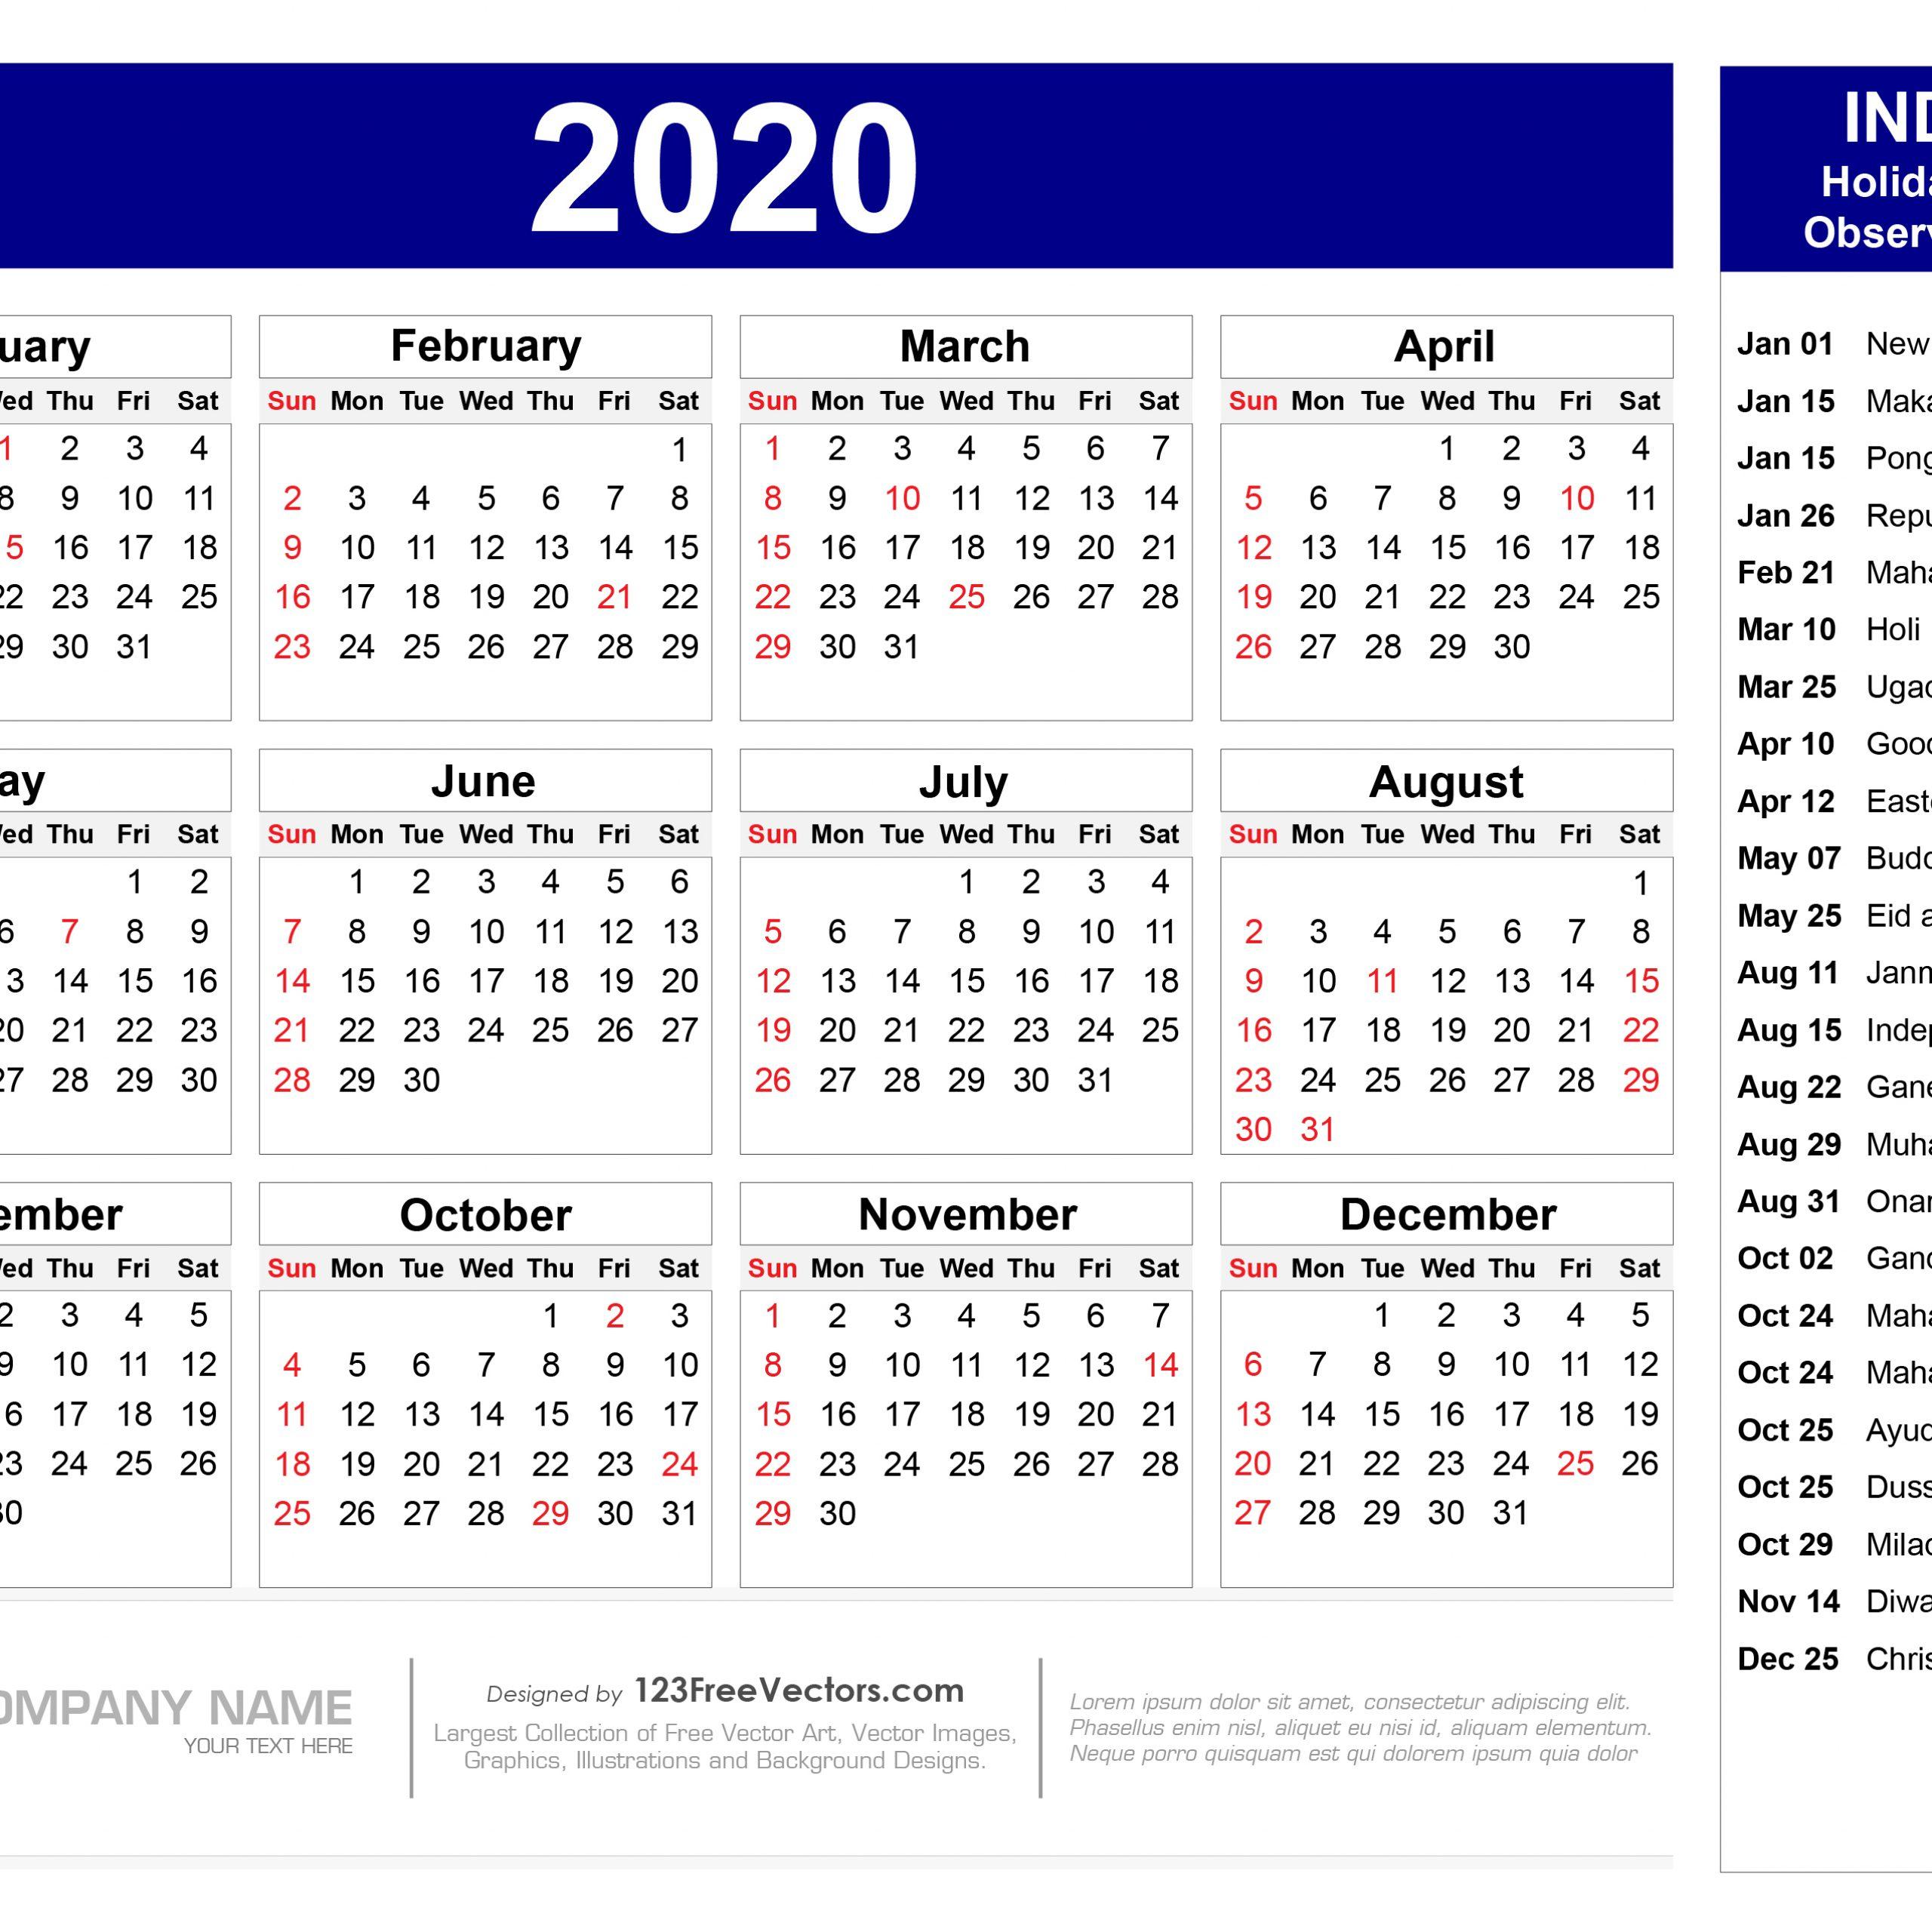 Calendar 2020 Holidays | Free Printable Calendar in Bihar Sarkar Holiday Calendar